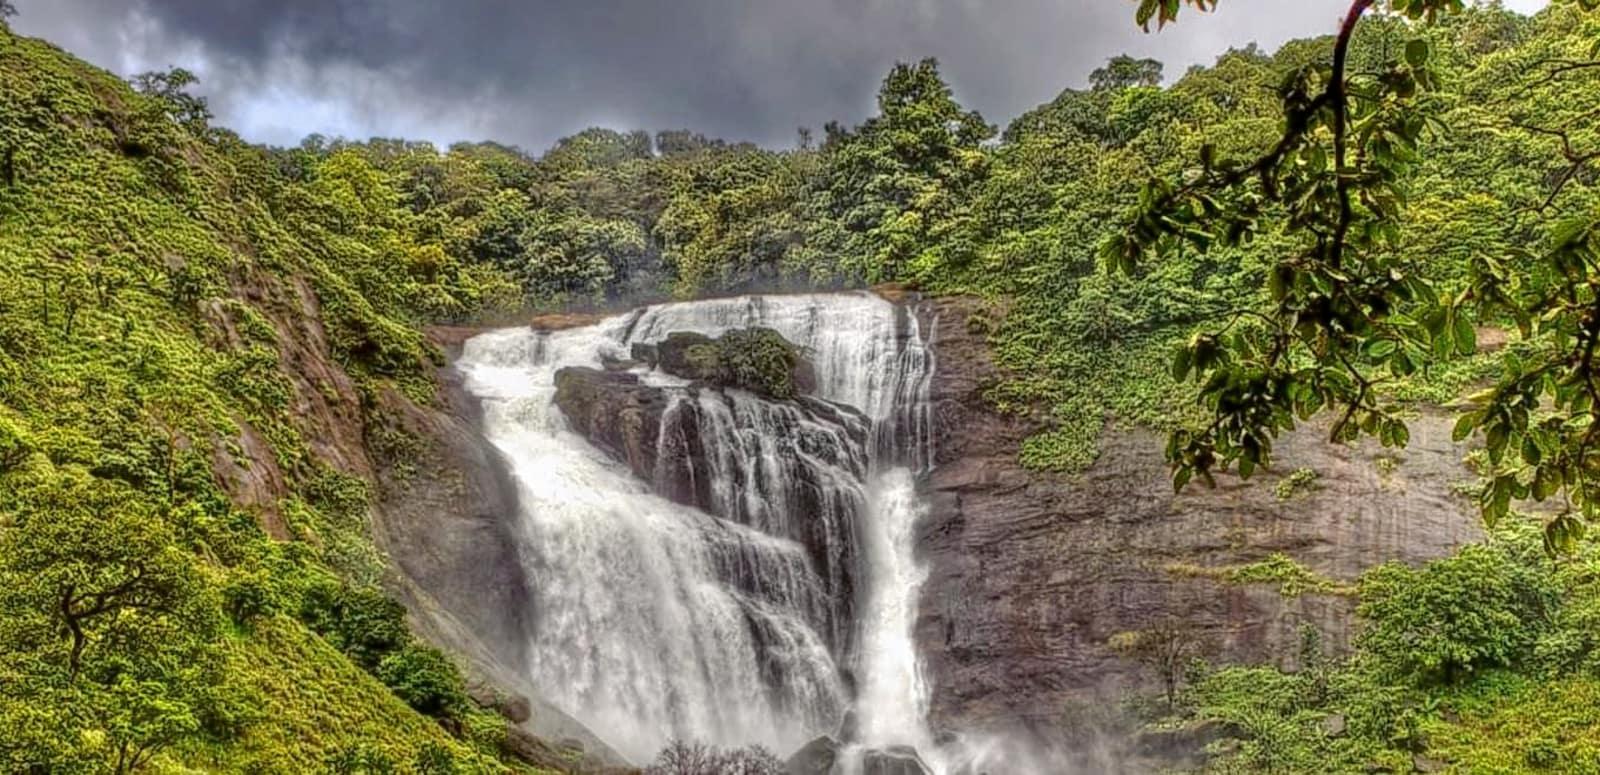 10 best places to visit in dandeli tourist places in dandeli